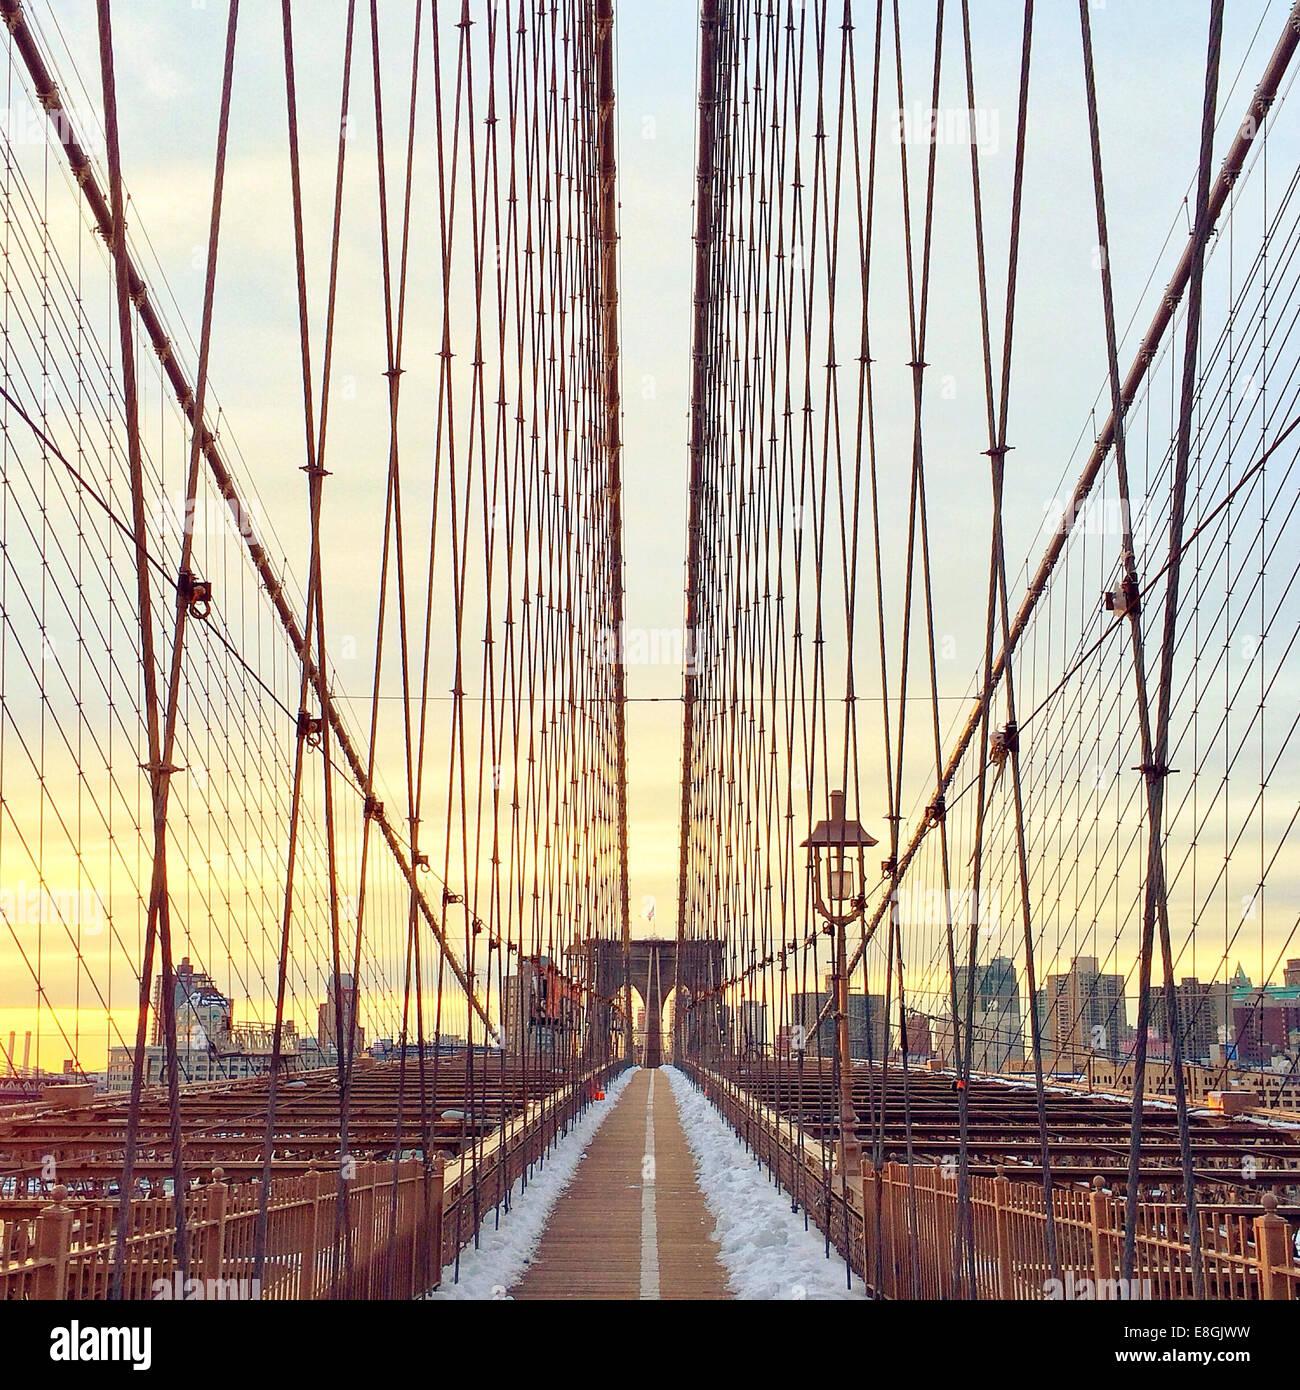 Brooklynbrücke bei Sonnenuntergang, New York, Amerika, USA Stockbild